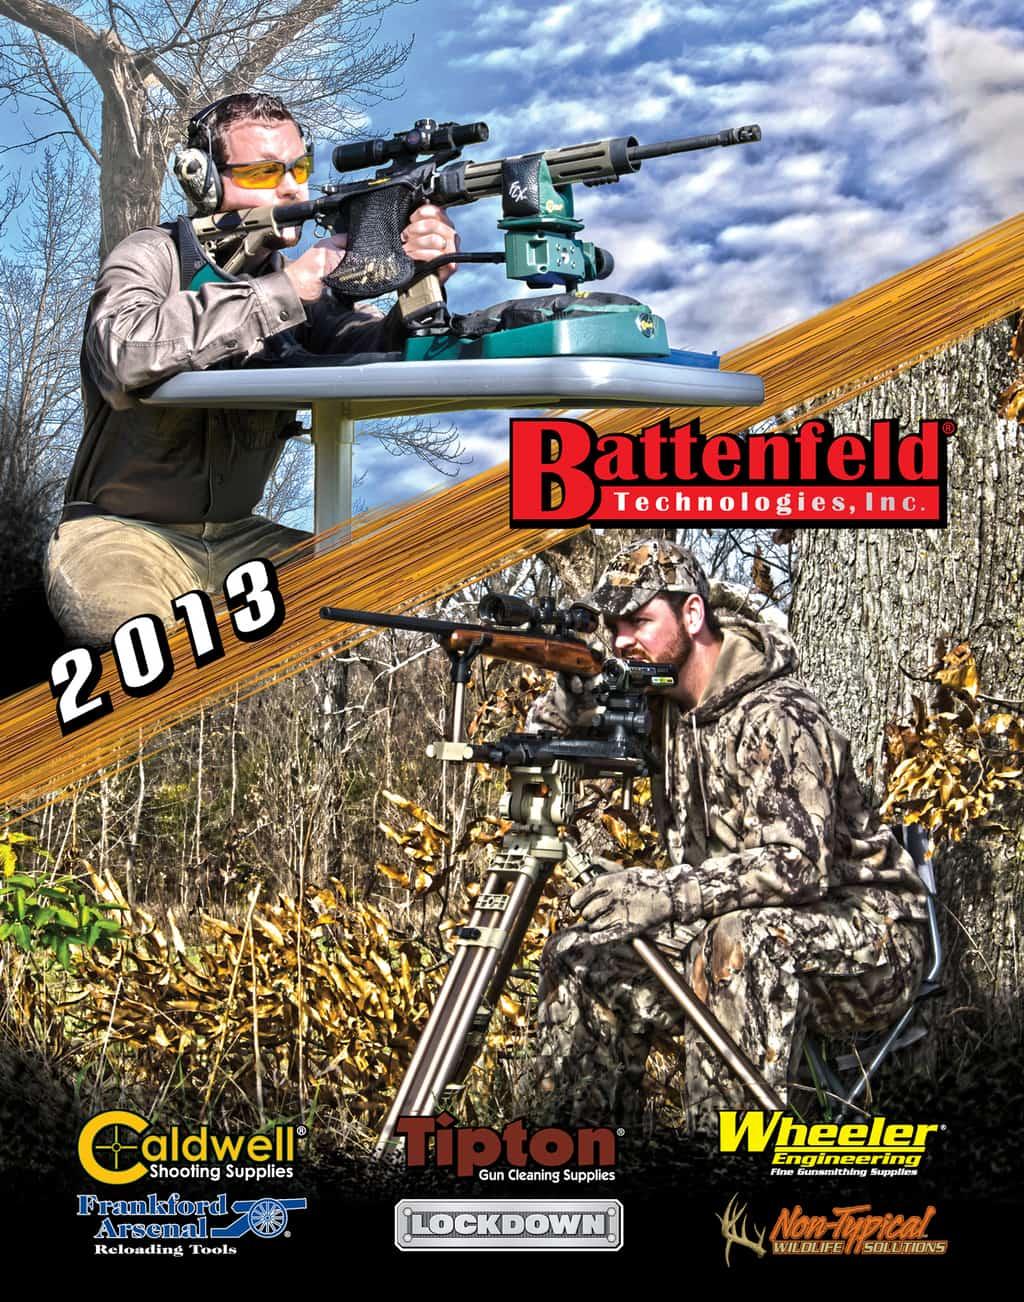 2013 Battenfeld Catalog